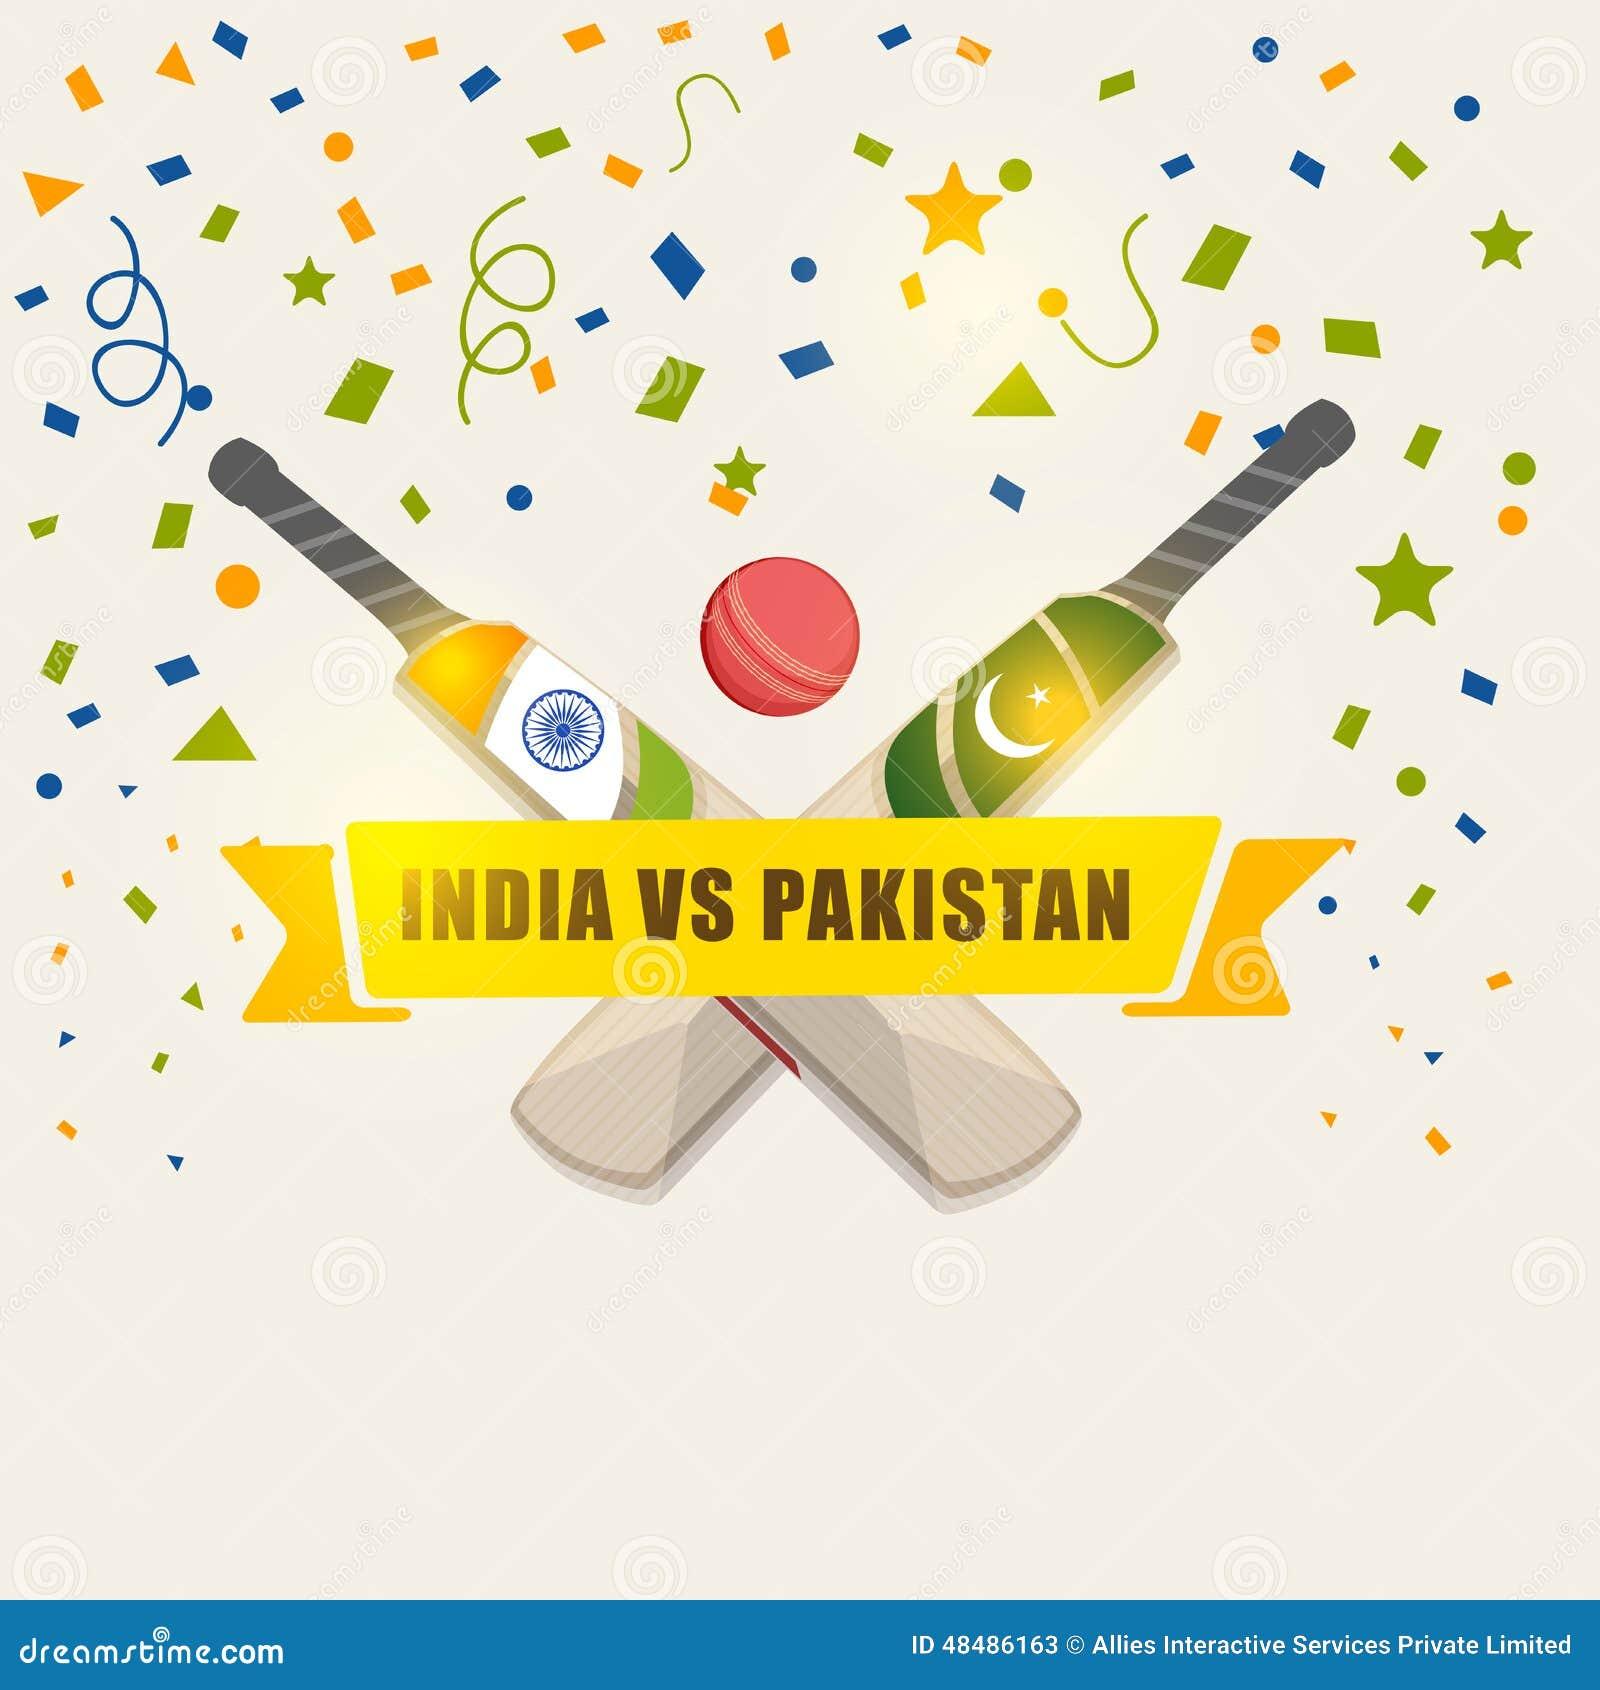 India Vs Pakistan Cricket match concept.